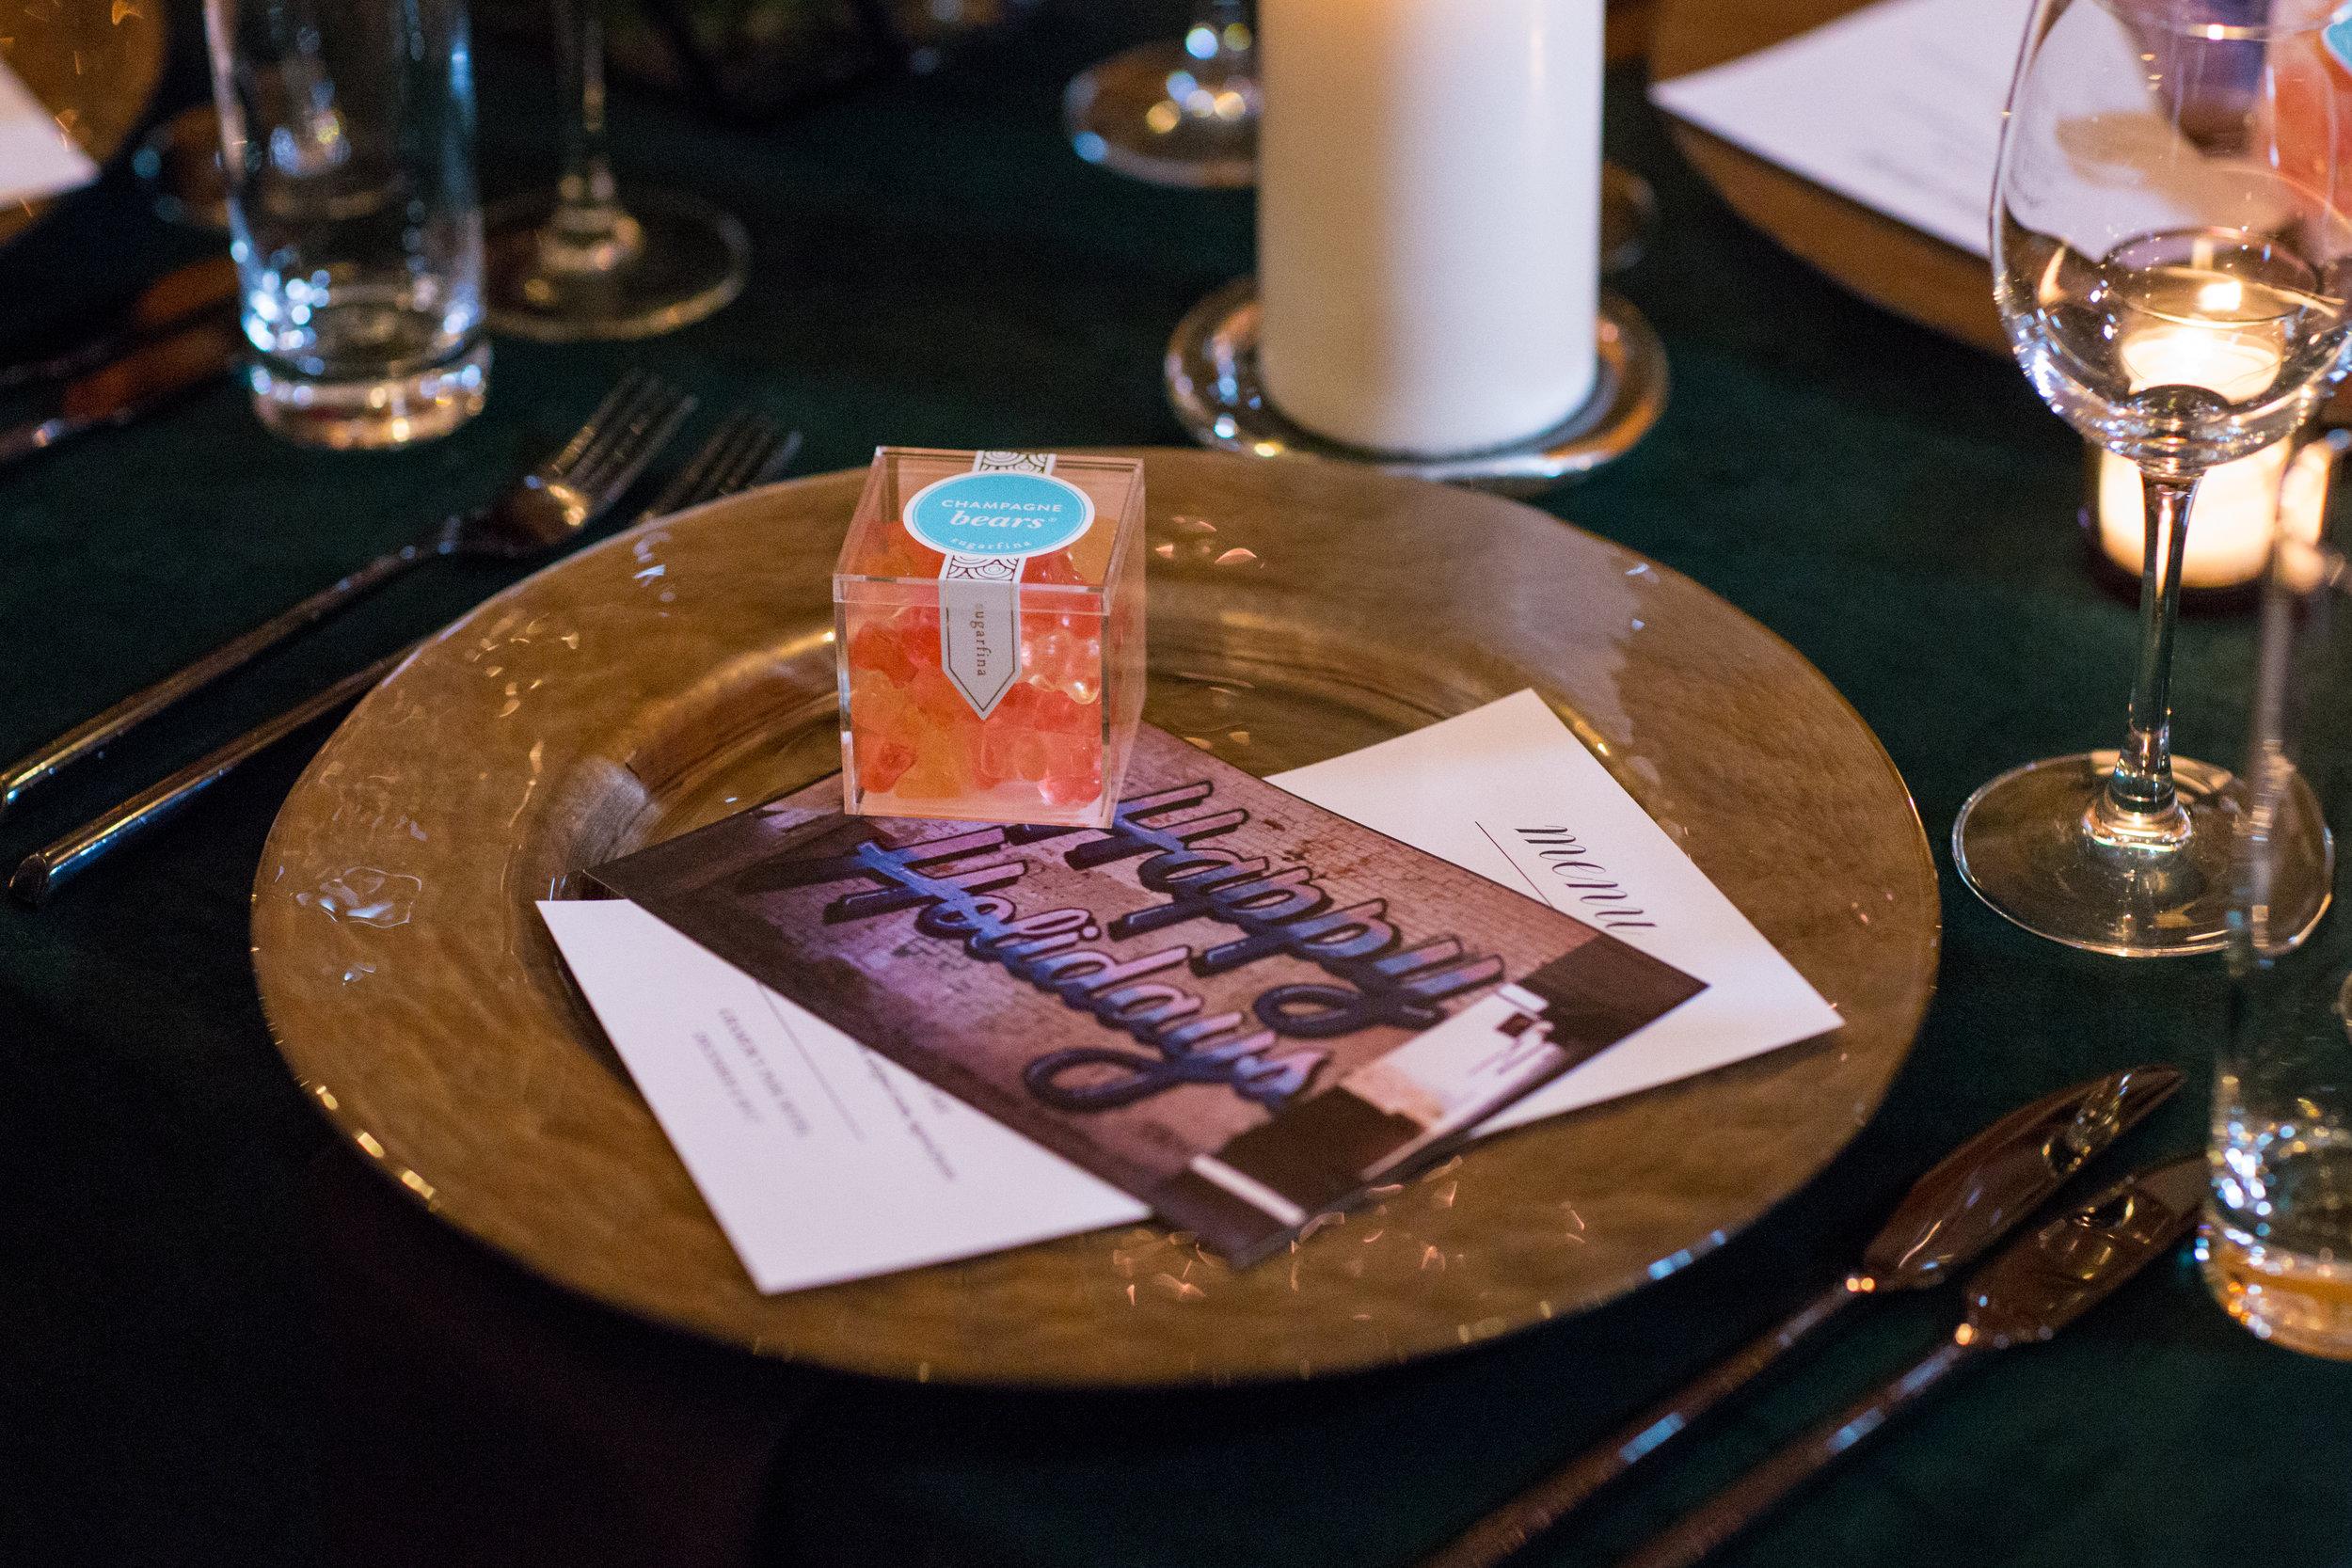 Gramercy-Park-Hotel-Holiday-Party-Andrea-Freeman-Events-4.JPG